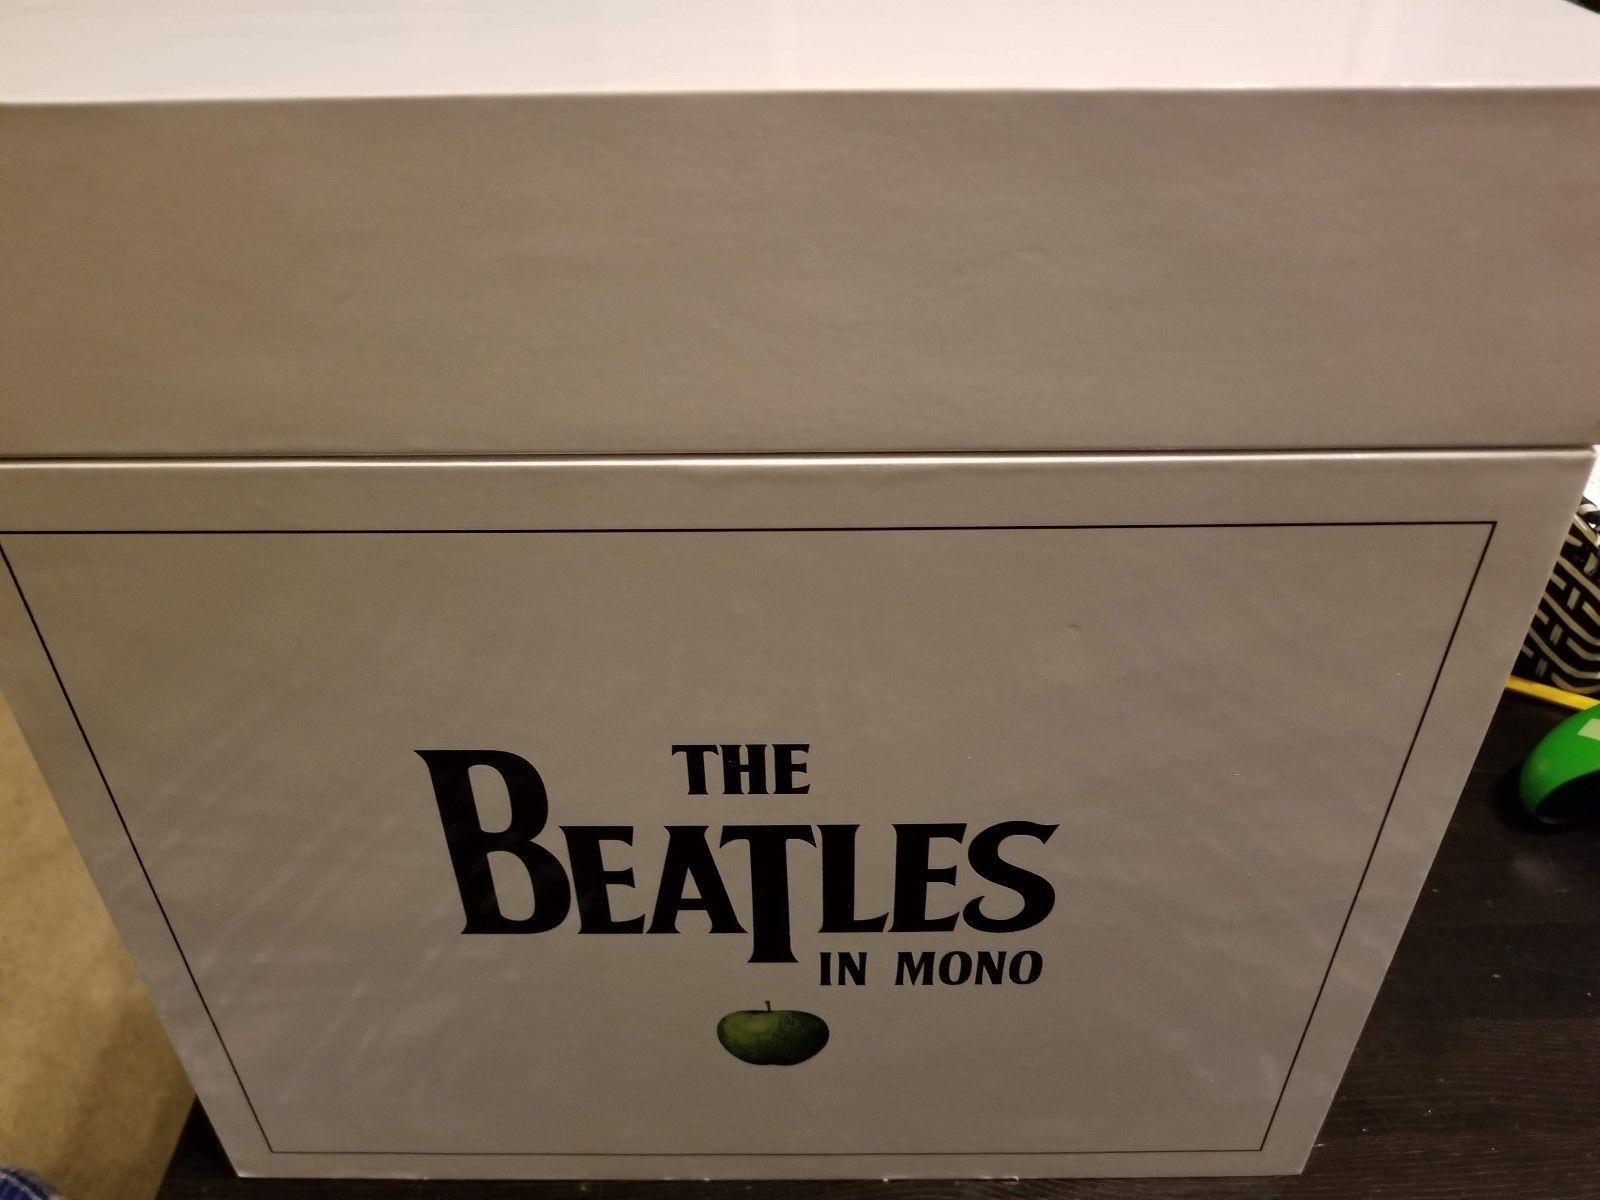 The Beatles in Mono [Vinyl BoxSet] New  14 Discs with book & case. Free NA Ship